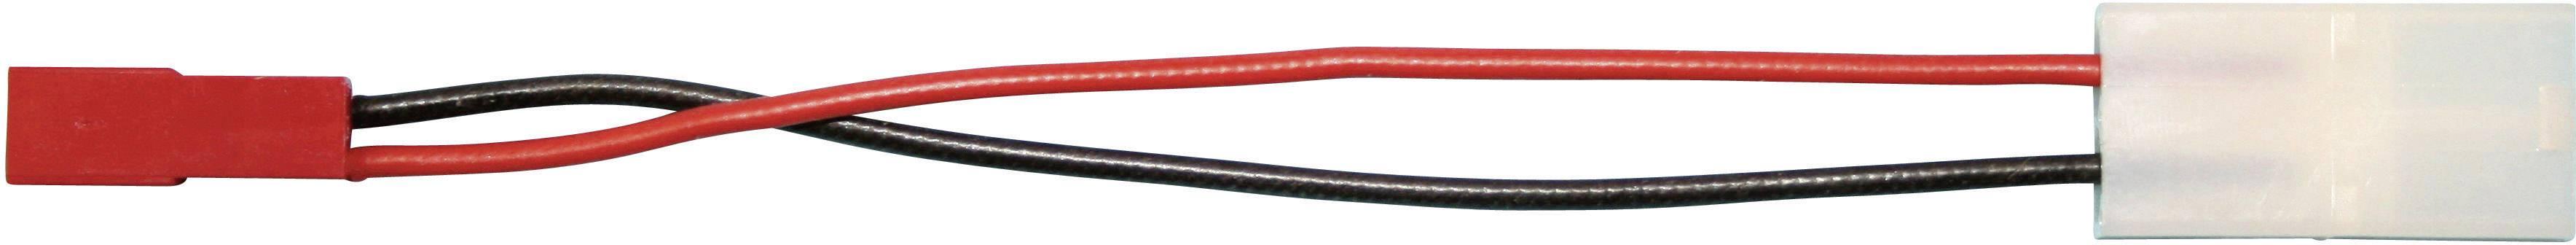 Redukce Tamiya zásuvka /BEC zástrčka Modelcraft, 100 mm, 0,5 mm²